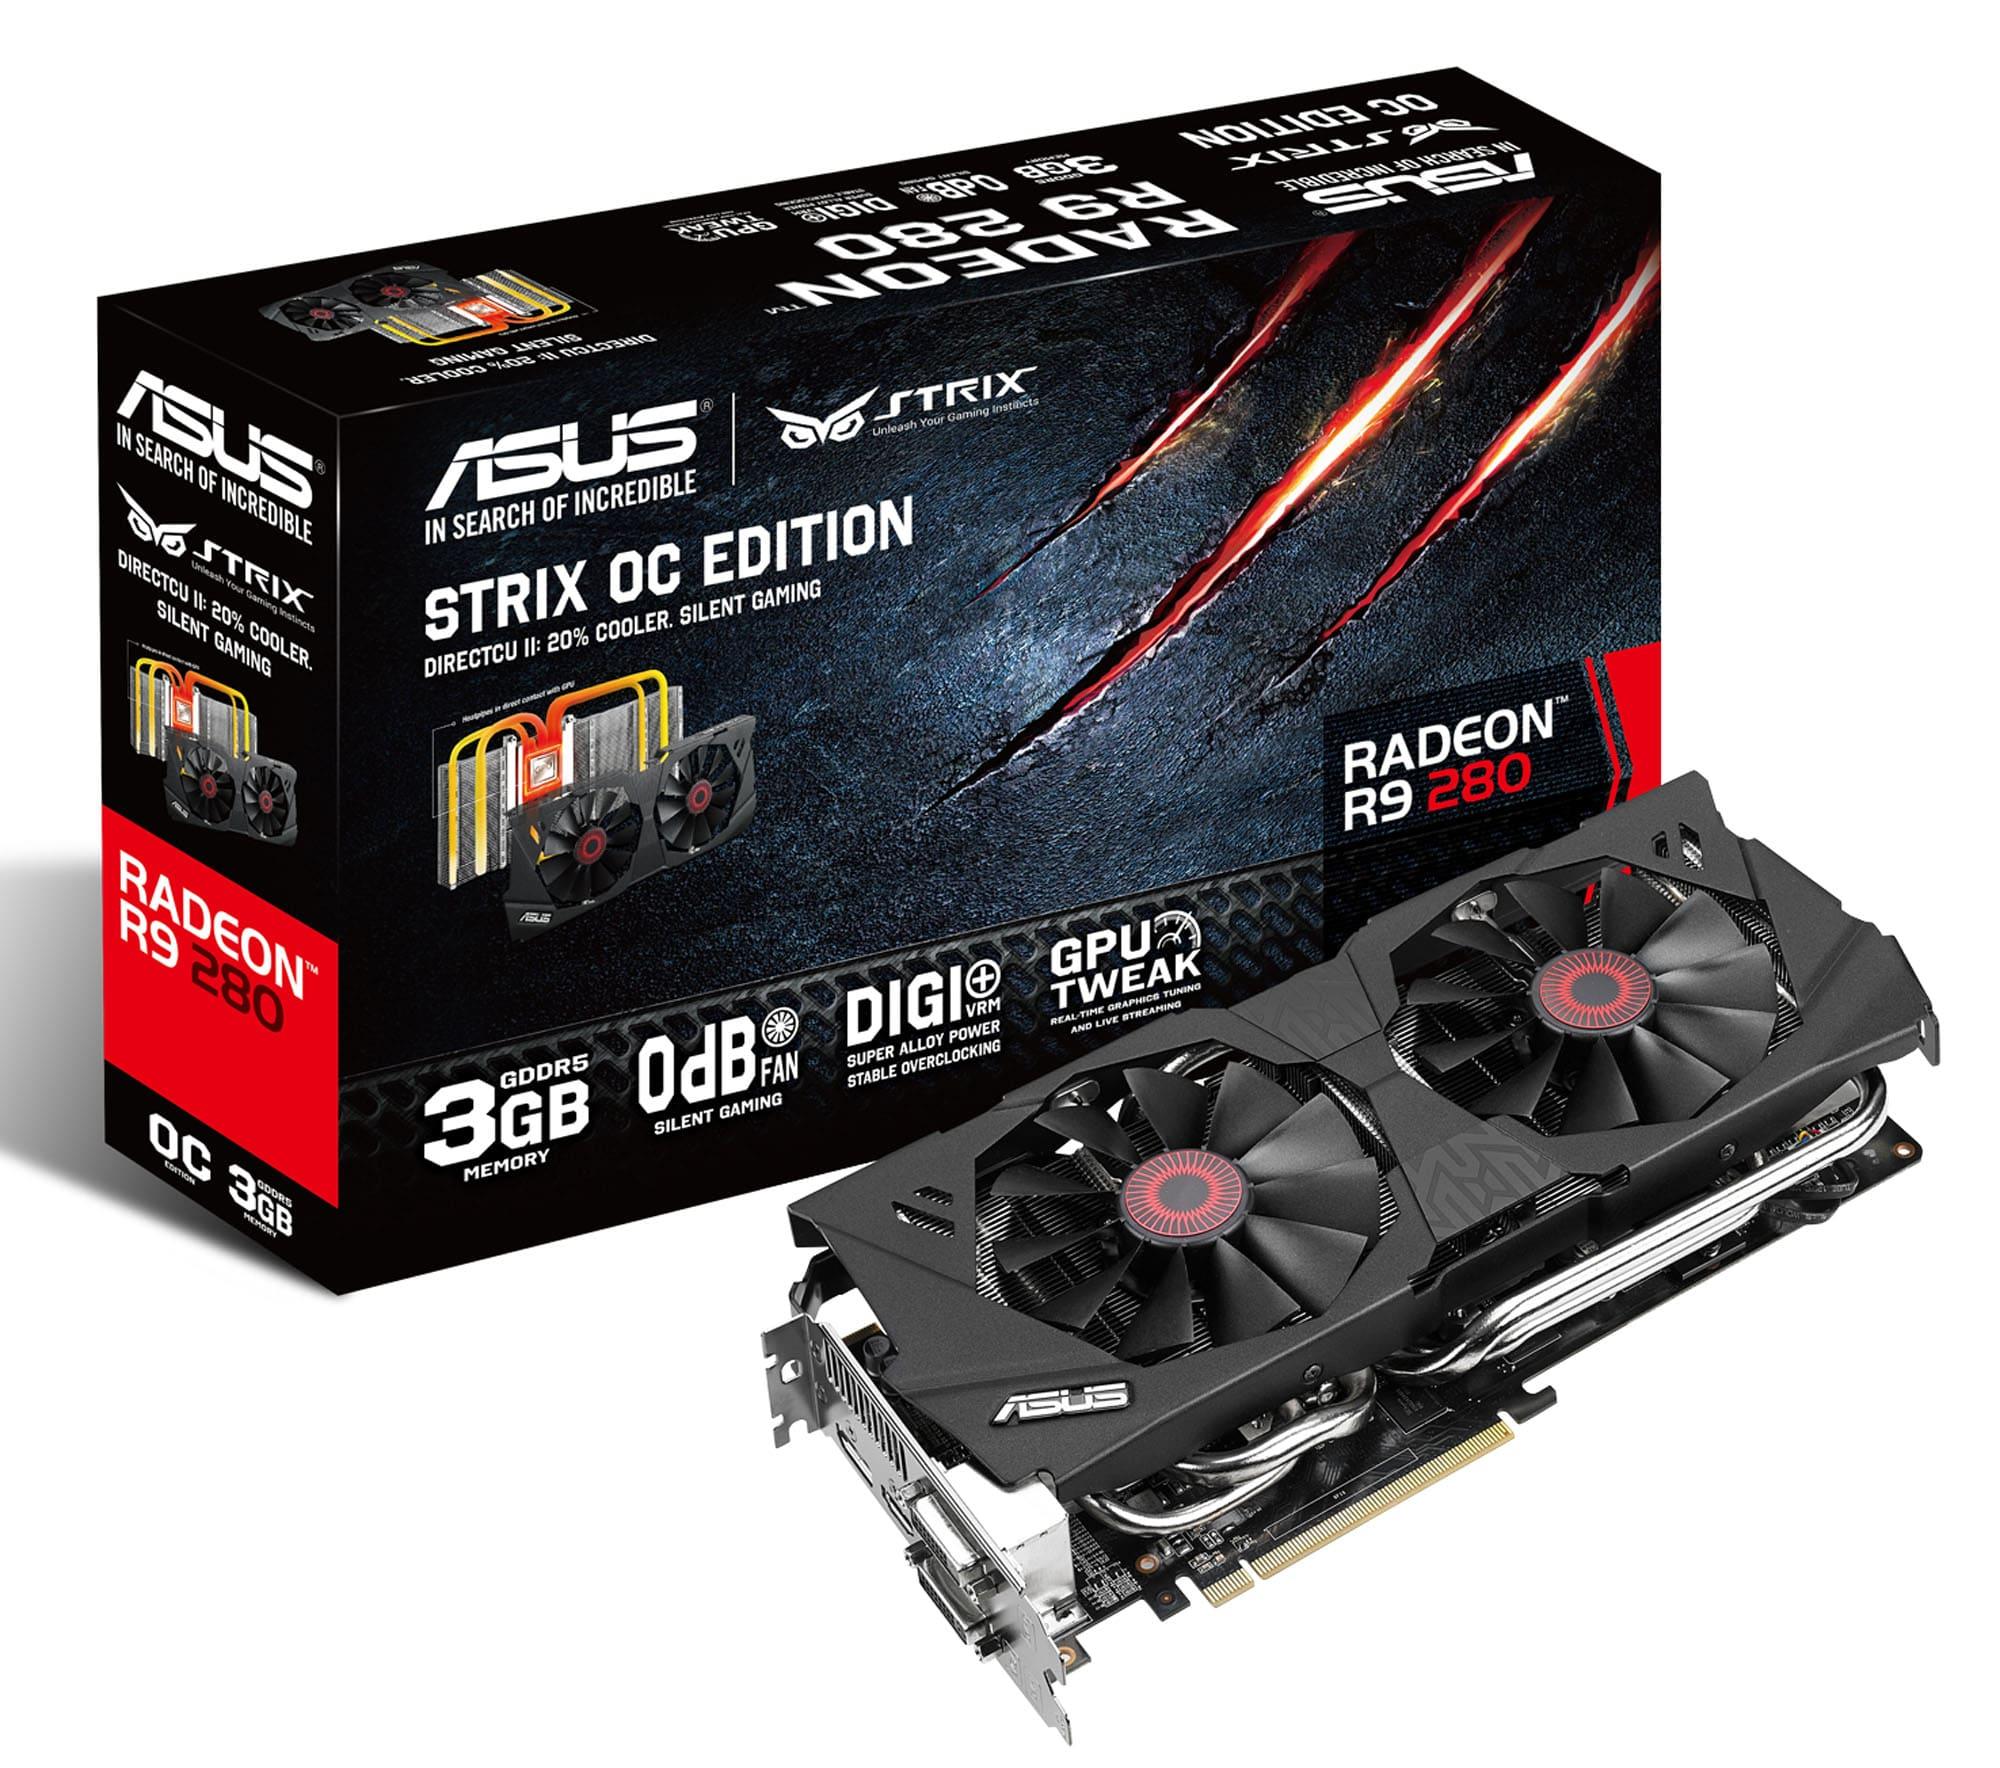 ASUS-STRIX-R9280-OC-3GD5_card+box-copy